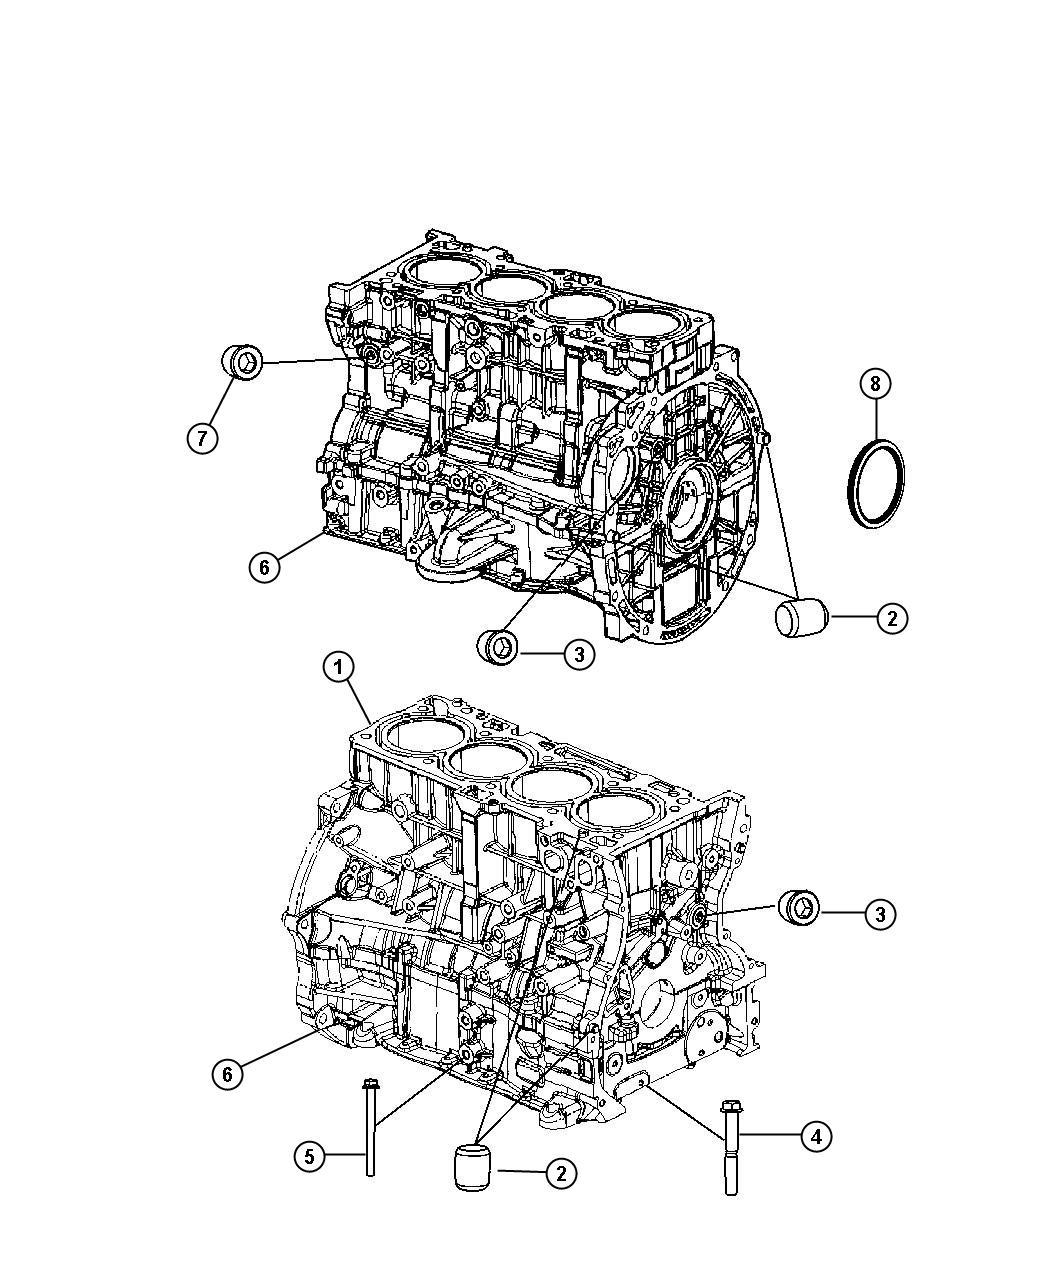 [DIAGRAM] Toyota 2 4l Engine Diagram FULL Version HD